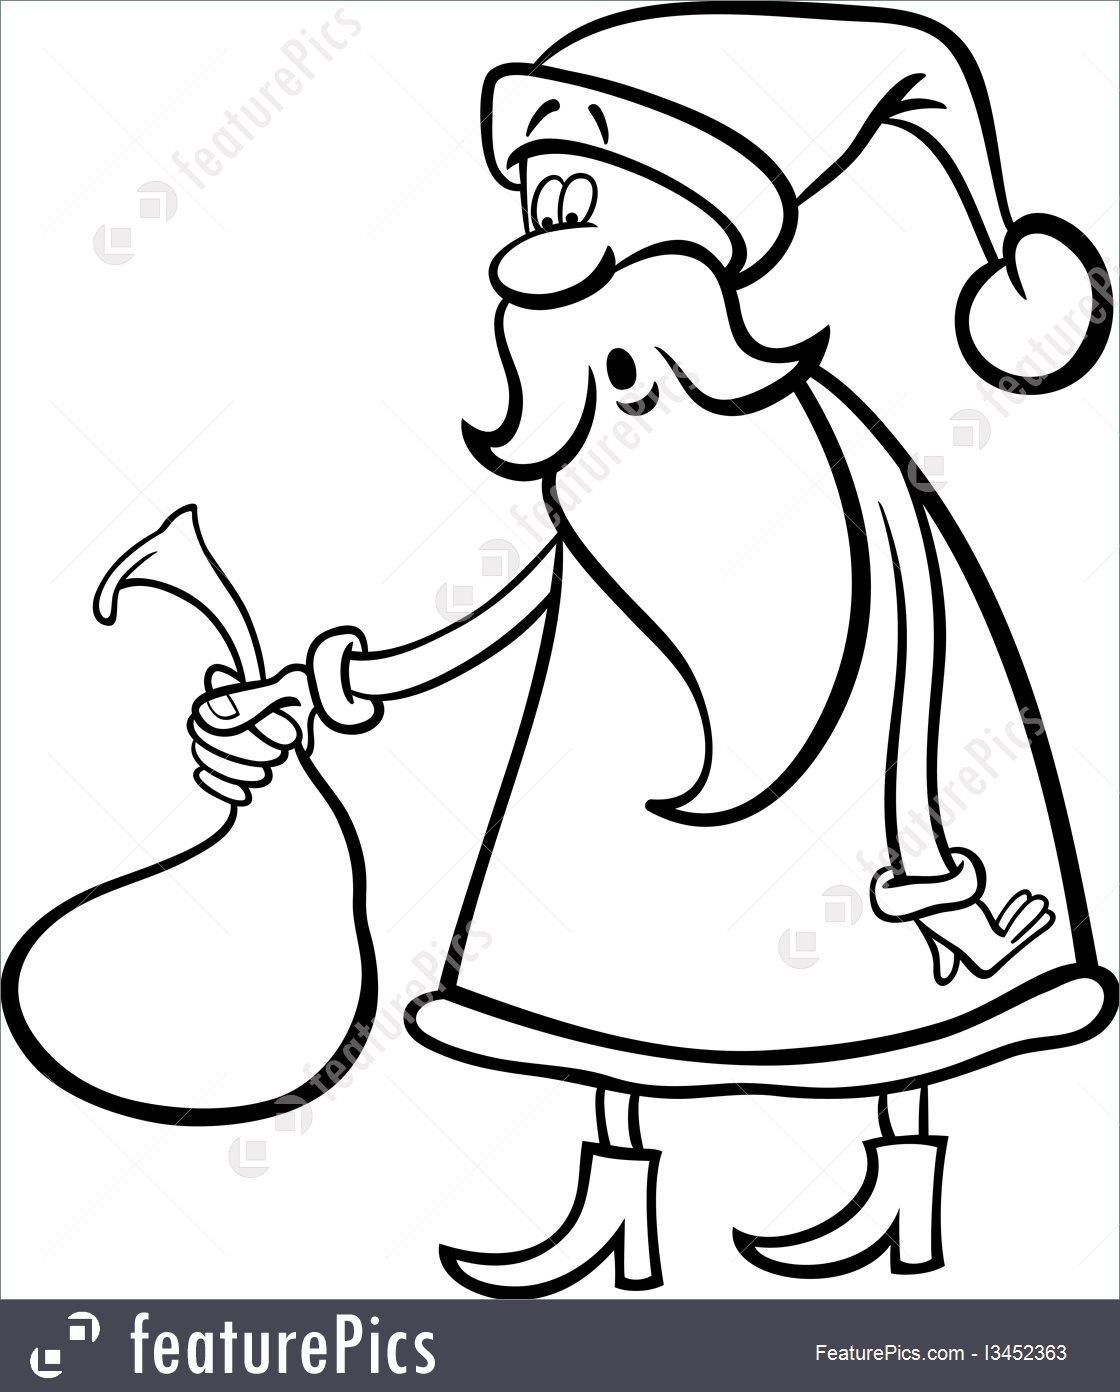 1120x1392 Holidays Santa Claus Cartoon For Coloring